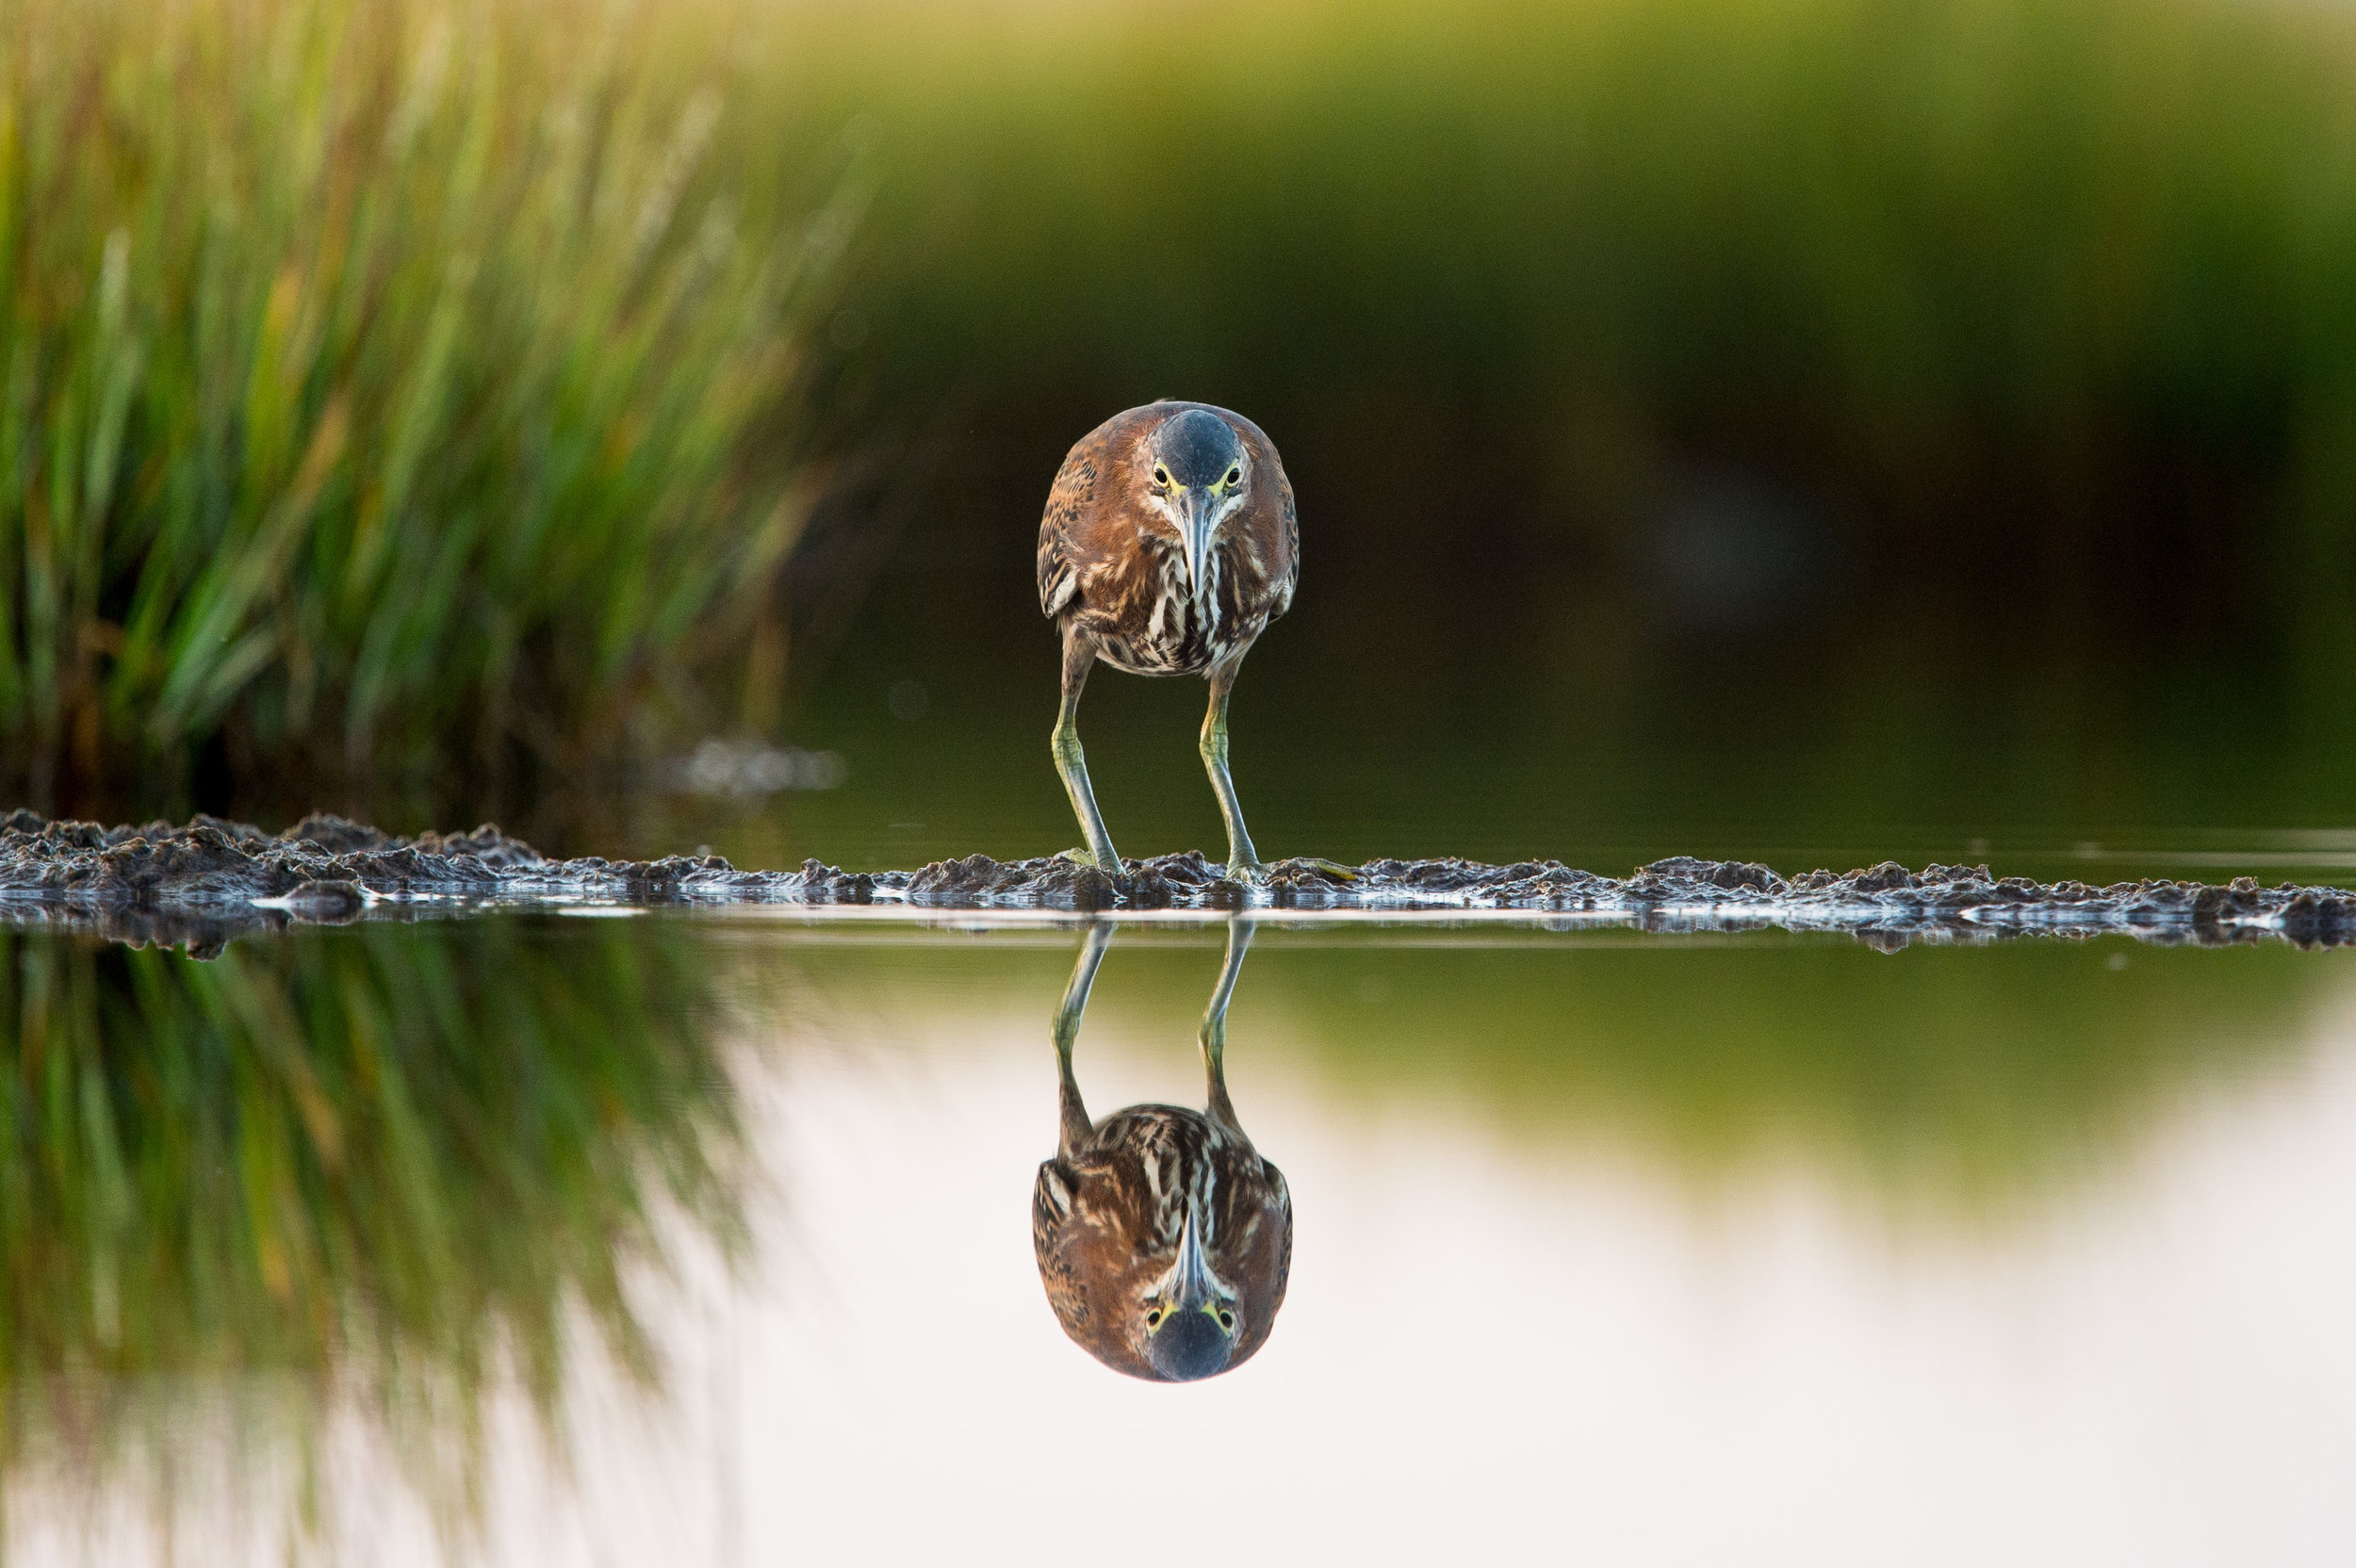 005_jersey_shorebirds.jpg